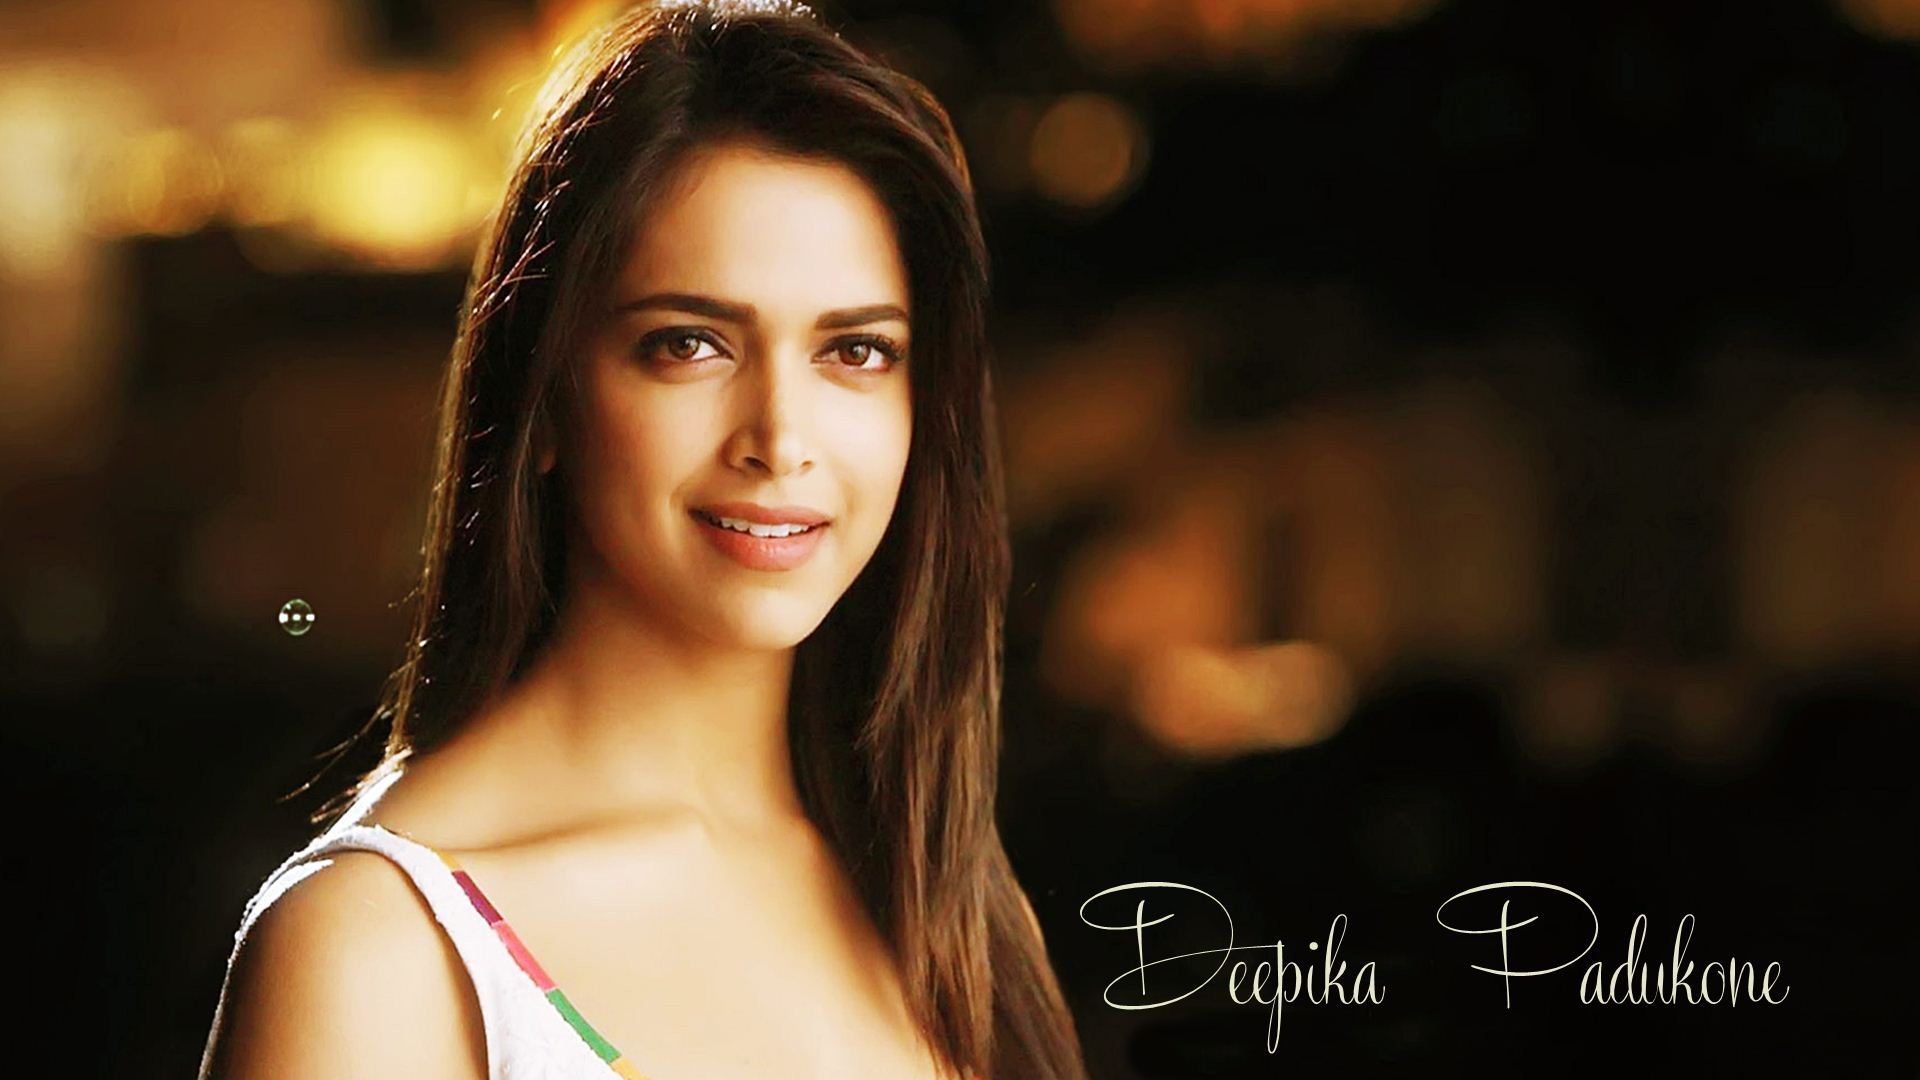 Deepika Padukone Cute Hd Wallpapers 1080p Deepika Padukone Wallpapers Pictures Images